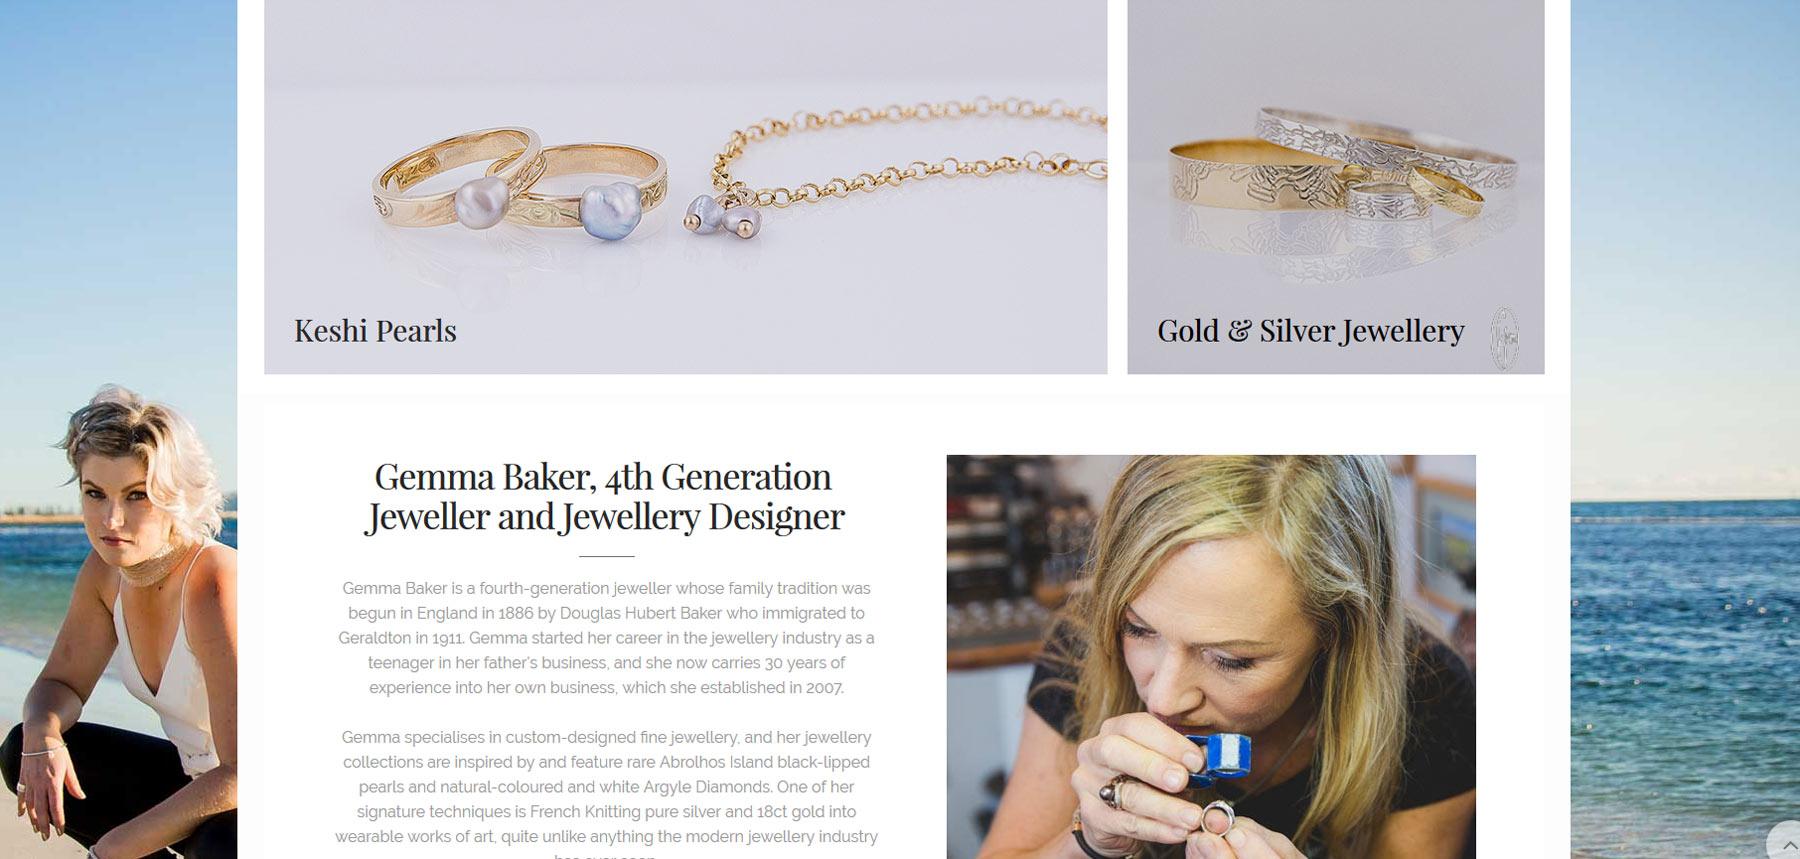 Gemma baker Jeweller website page